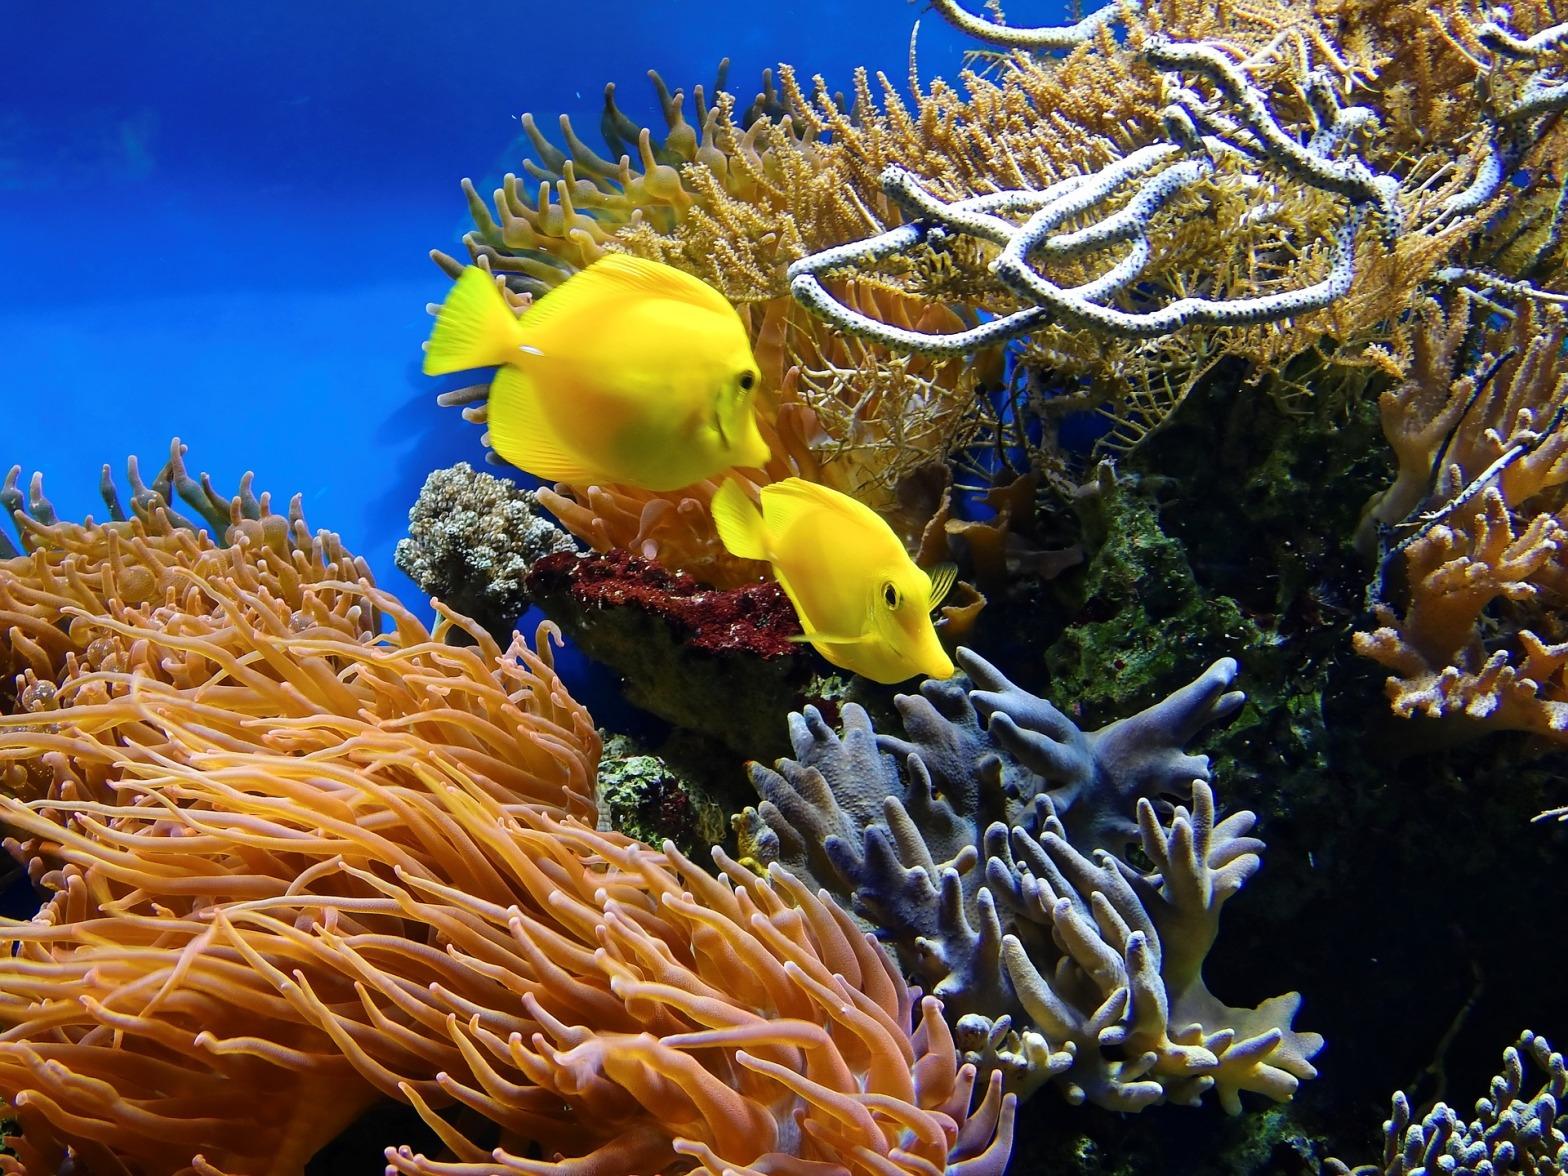 barriera-corallina-inquinamento-sbiancamento-morte-disastro-ambientale-articolo-blog